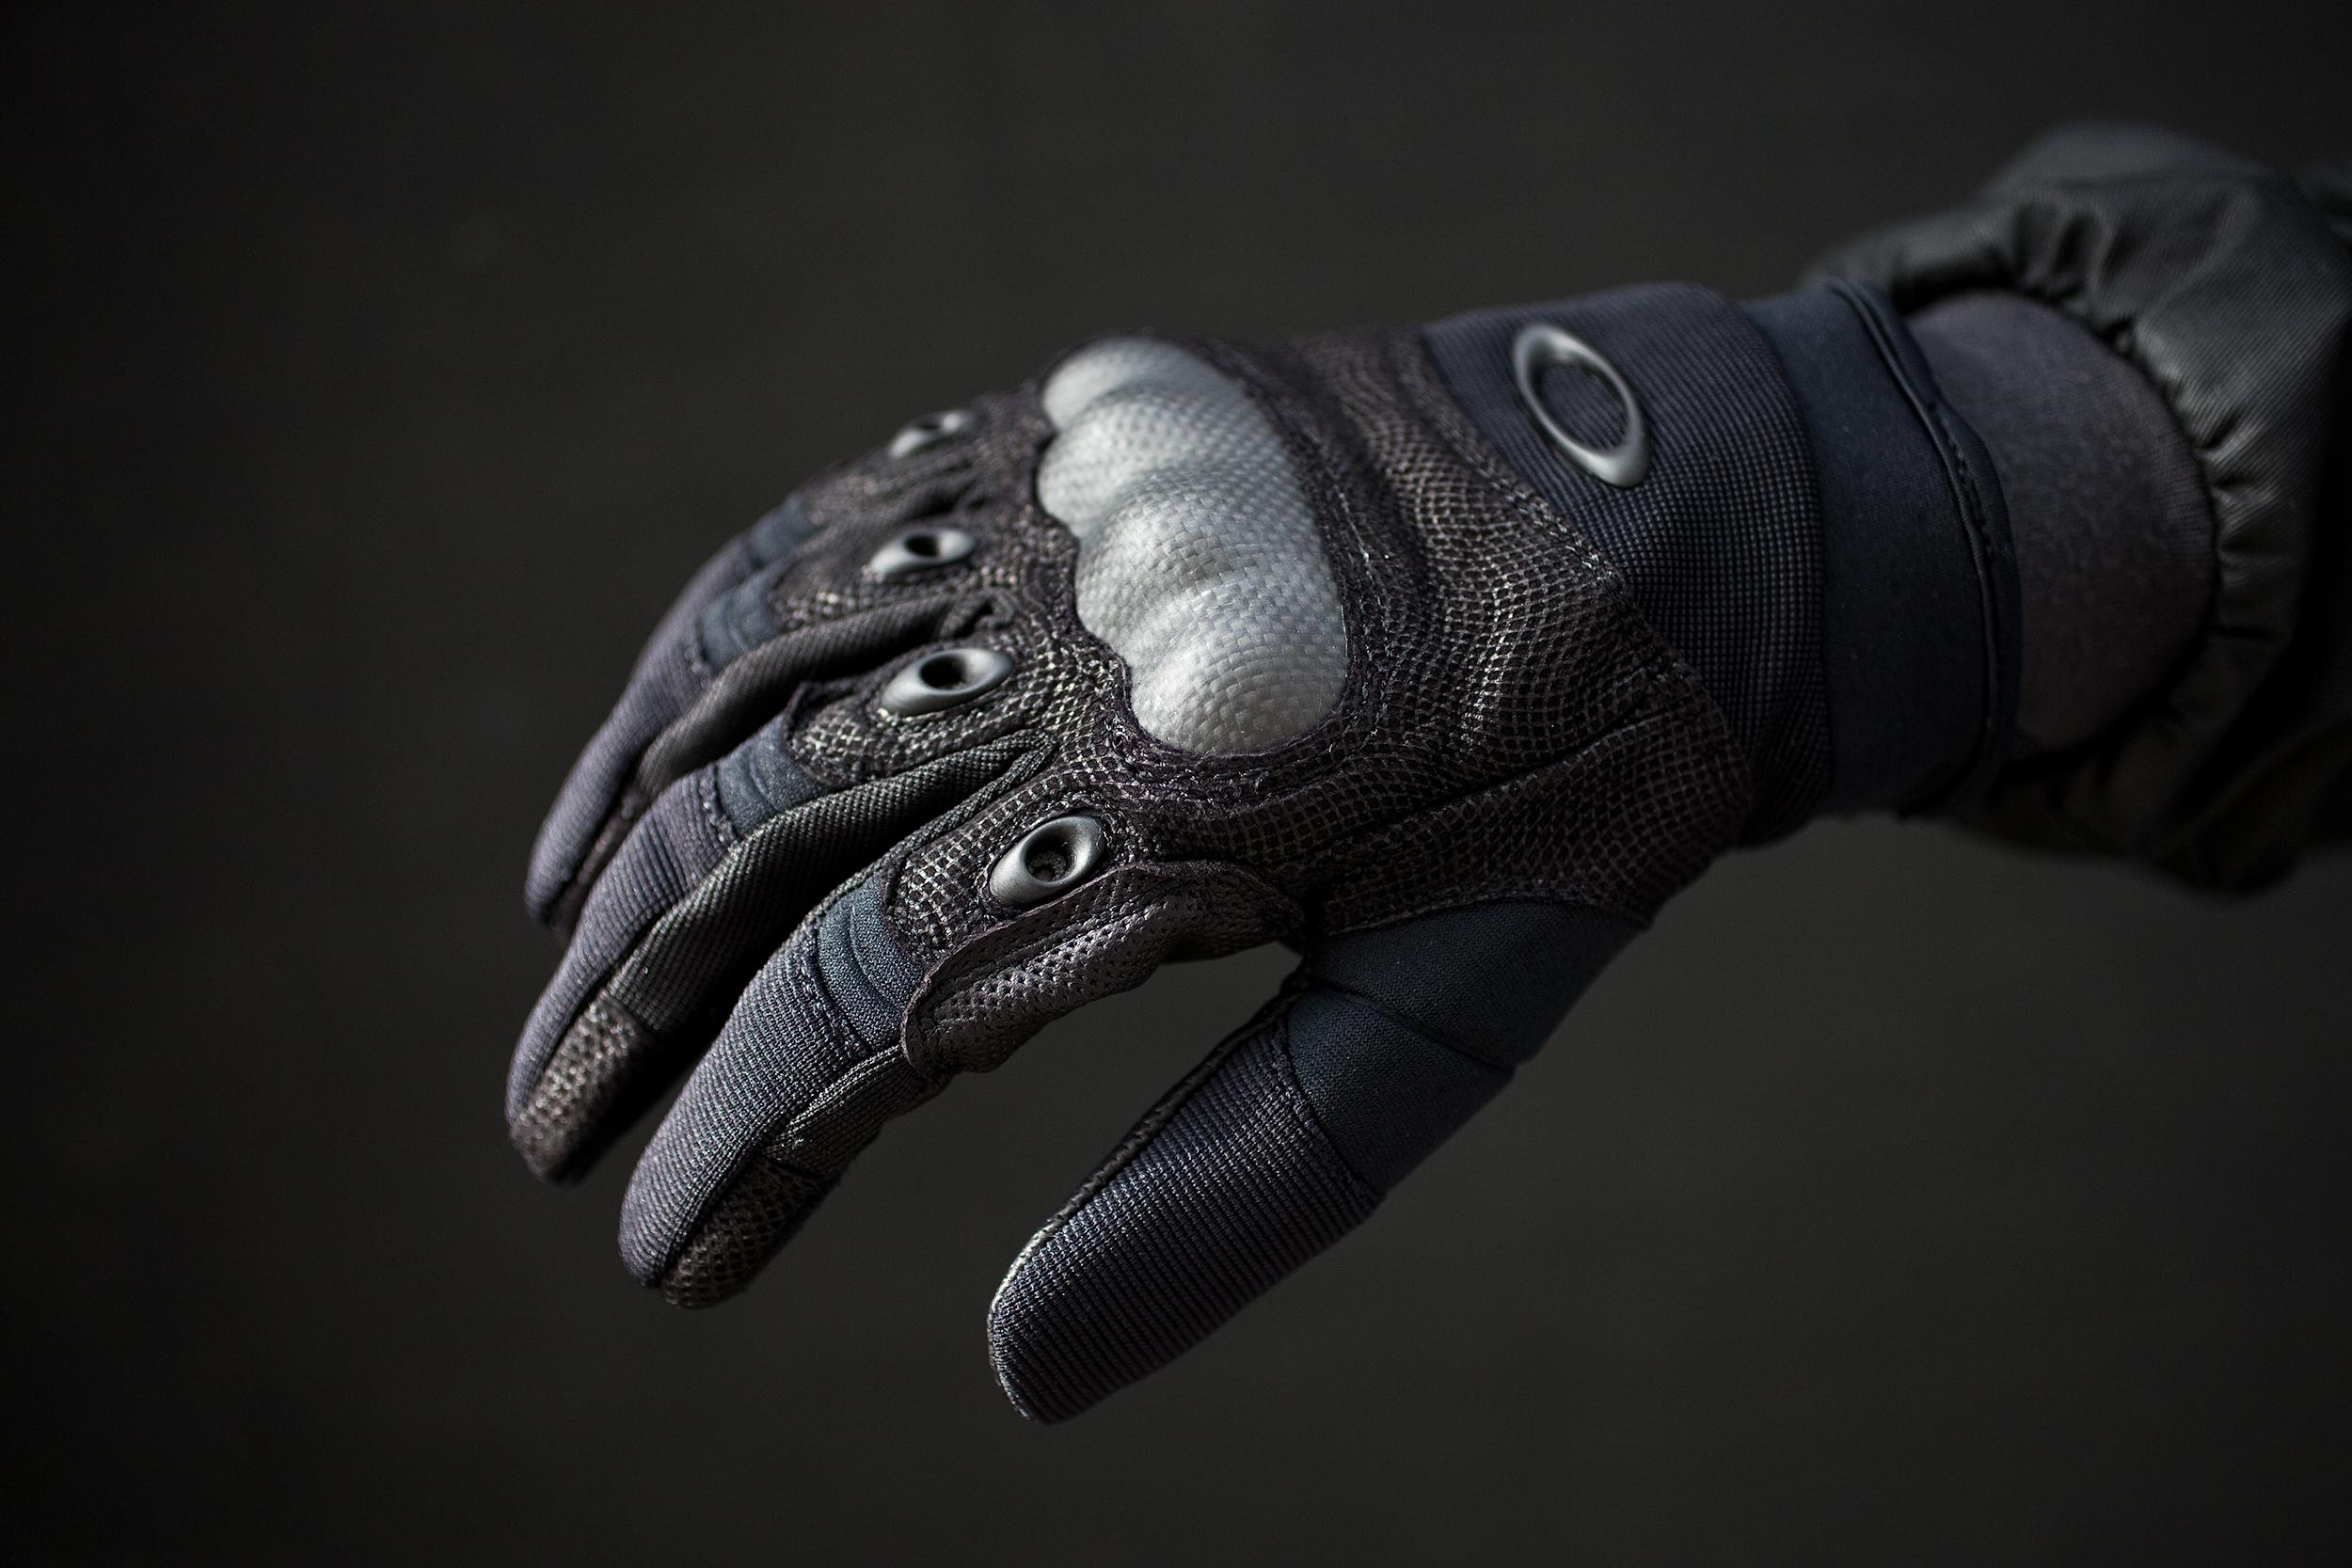 Перчатки Oakley (карбон, кевлар, козья кожа, неопрен, лайкра)